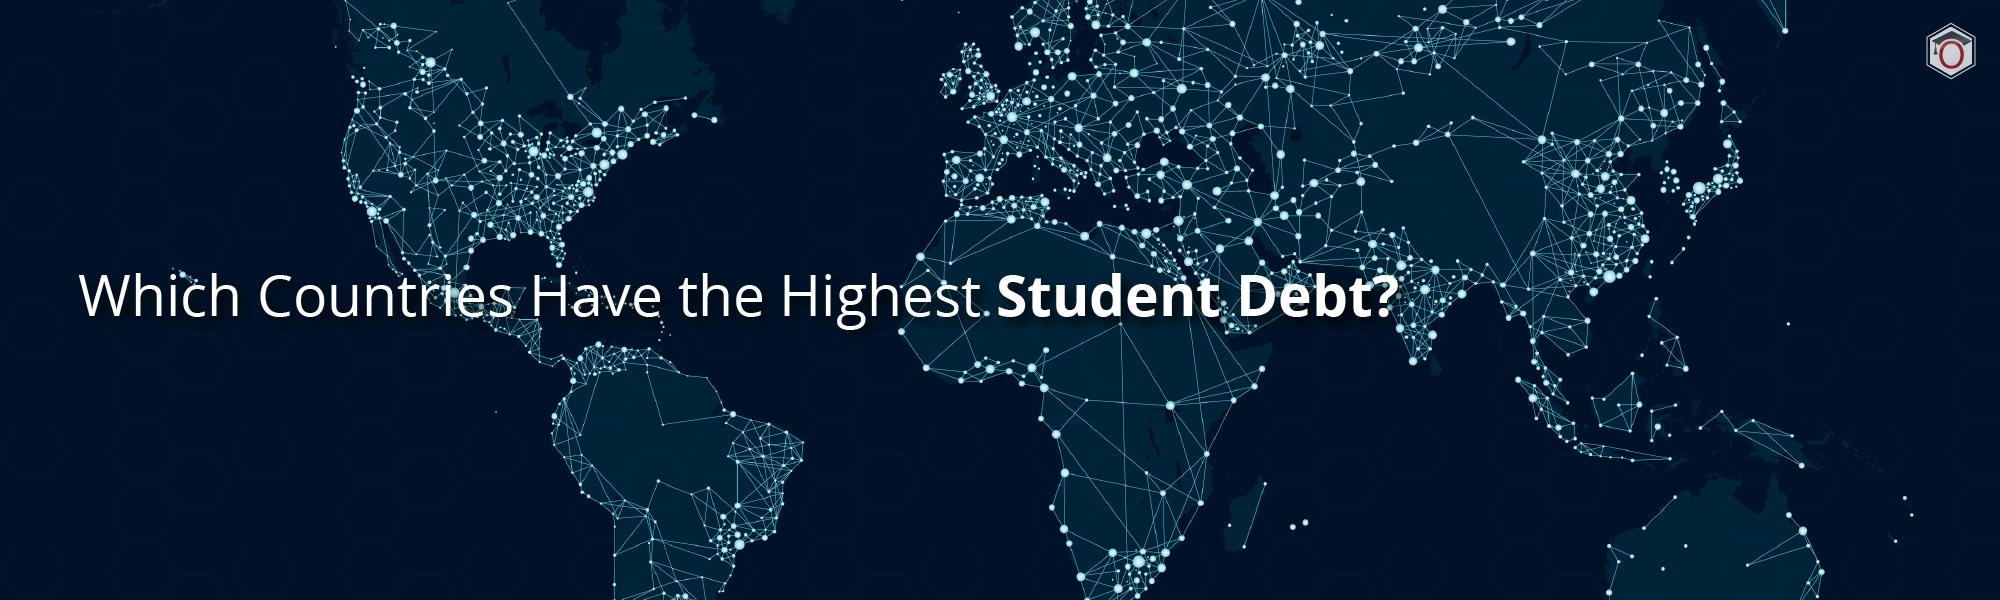 World Student Loan Debt